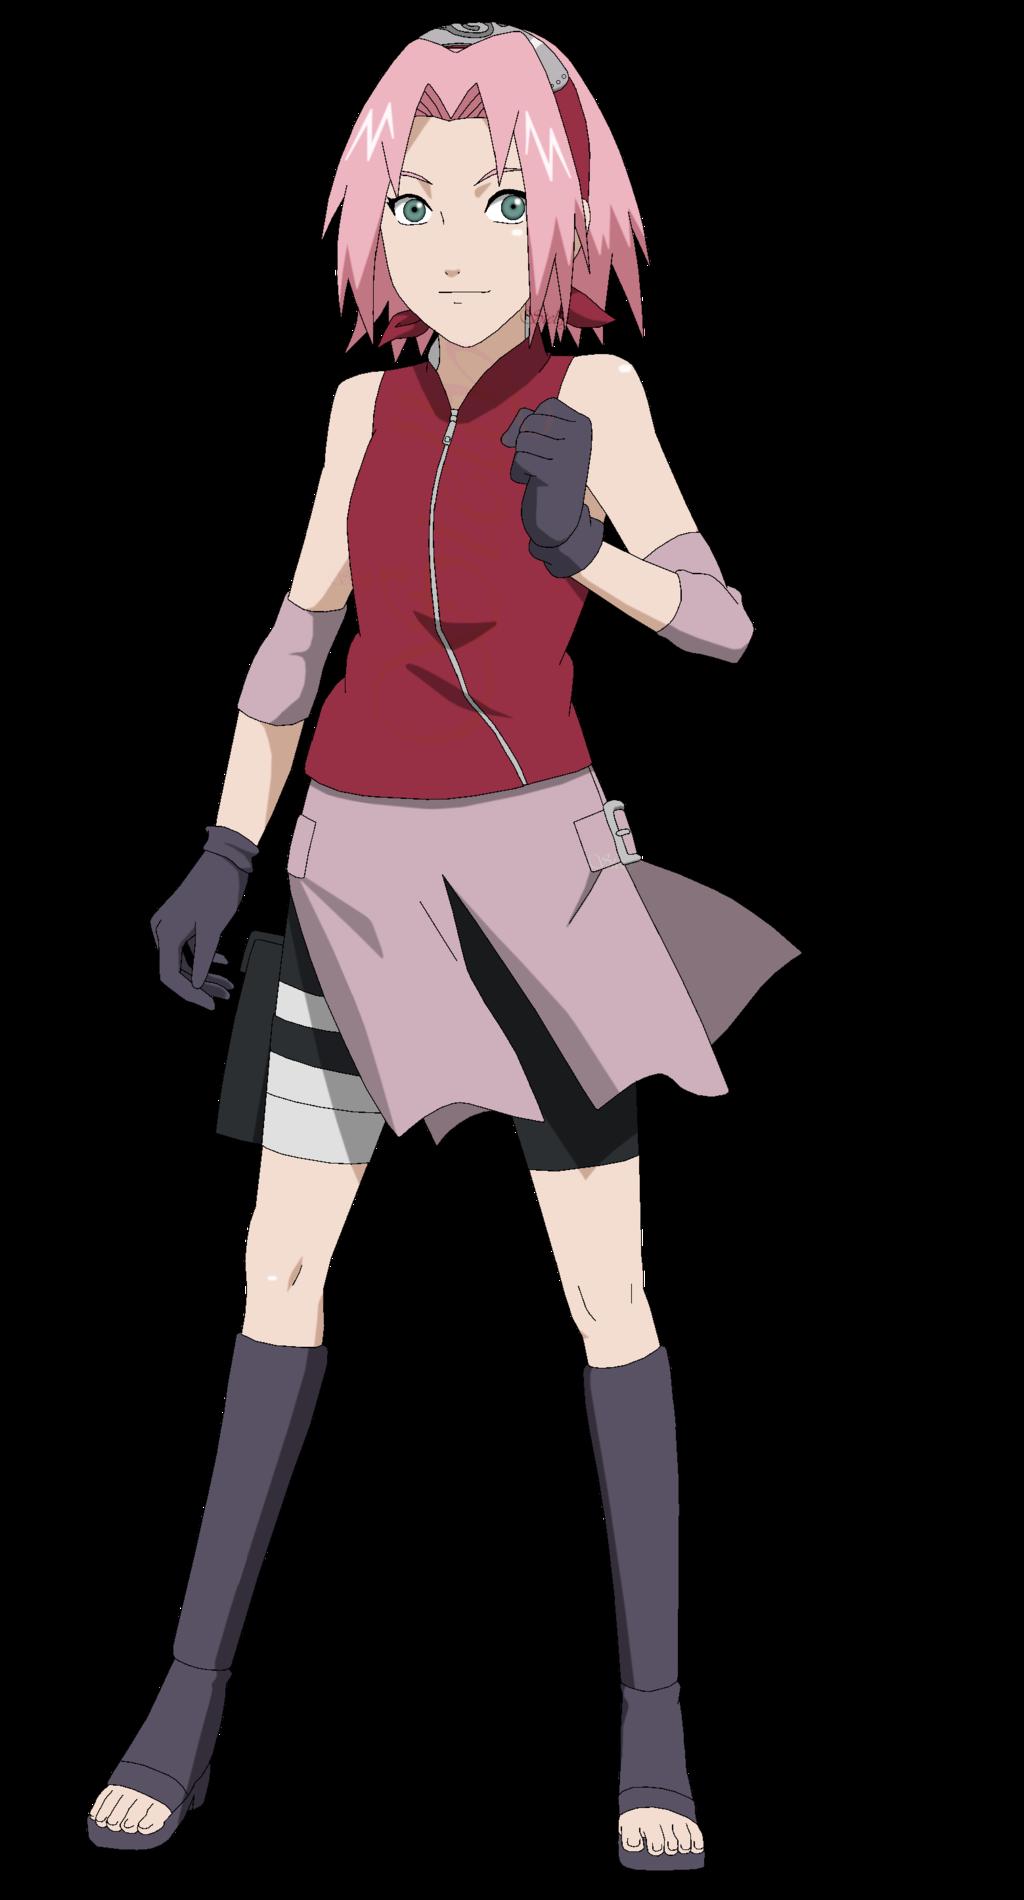 Naruto and sakura start dating fanfiction 4